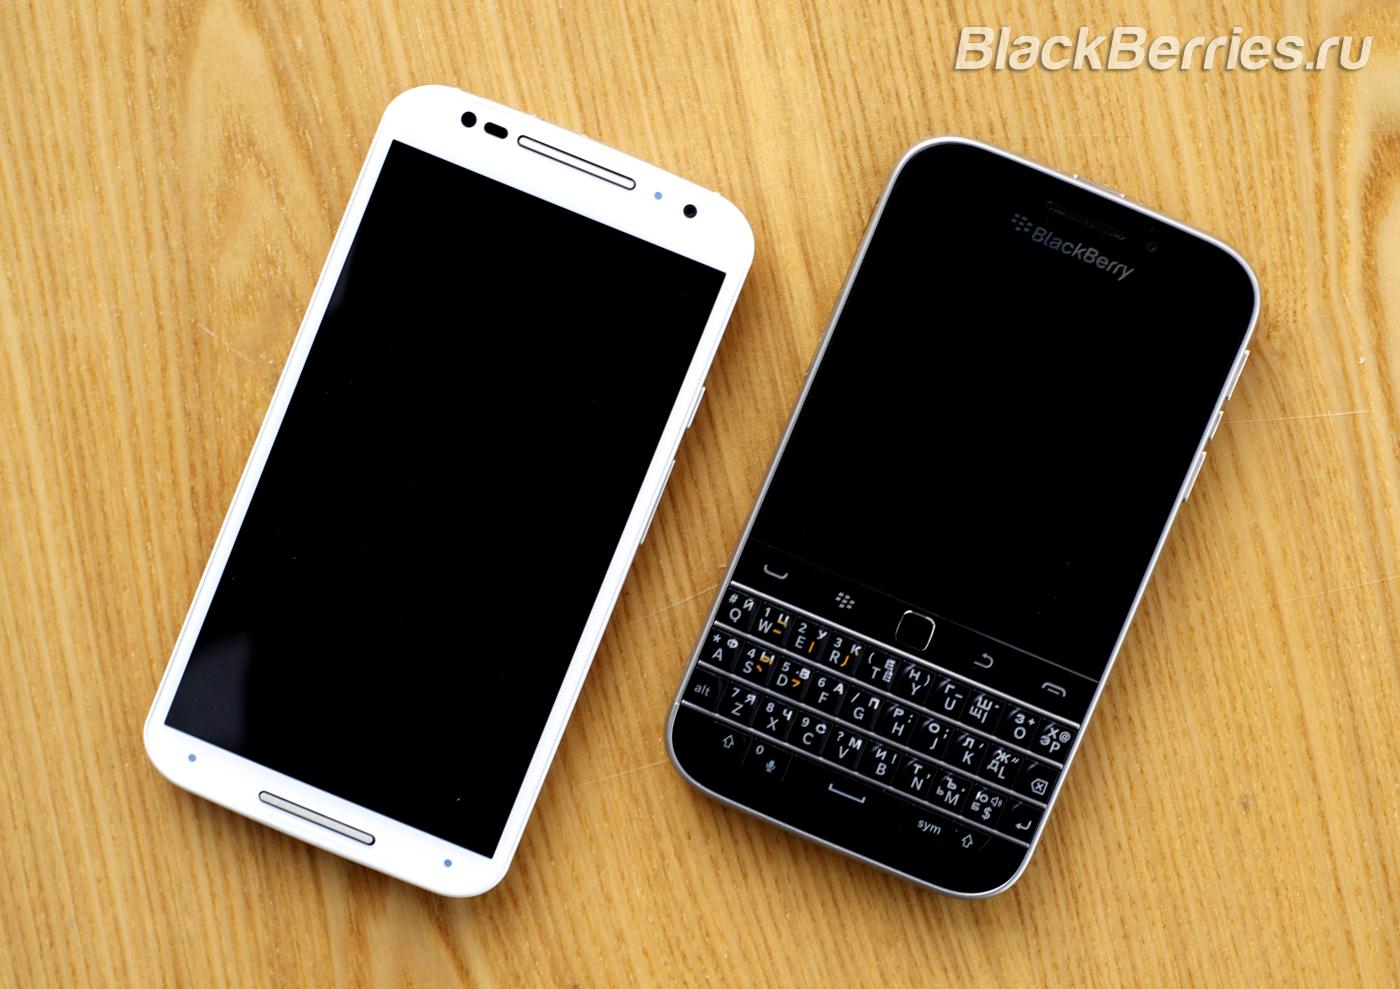 BlackBerry-Passport-Classic-Motorola-Moto-X-24